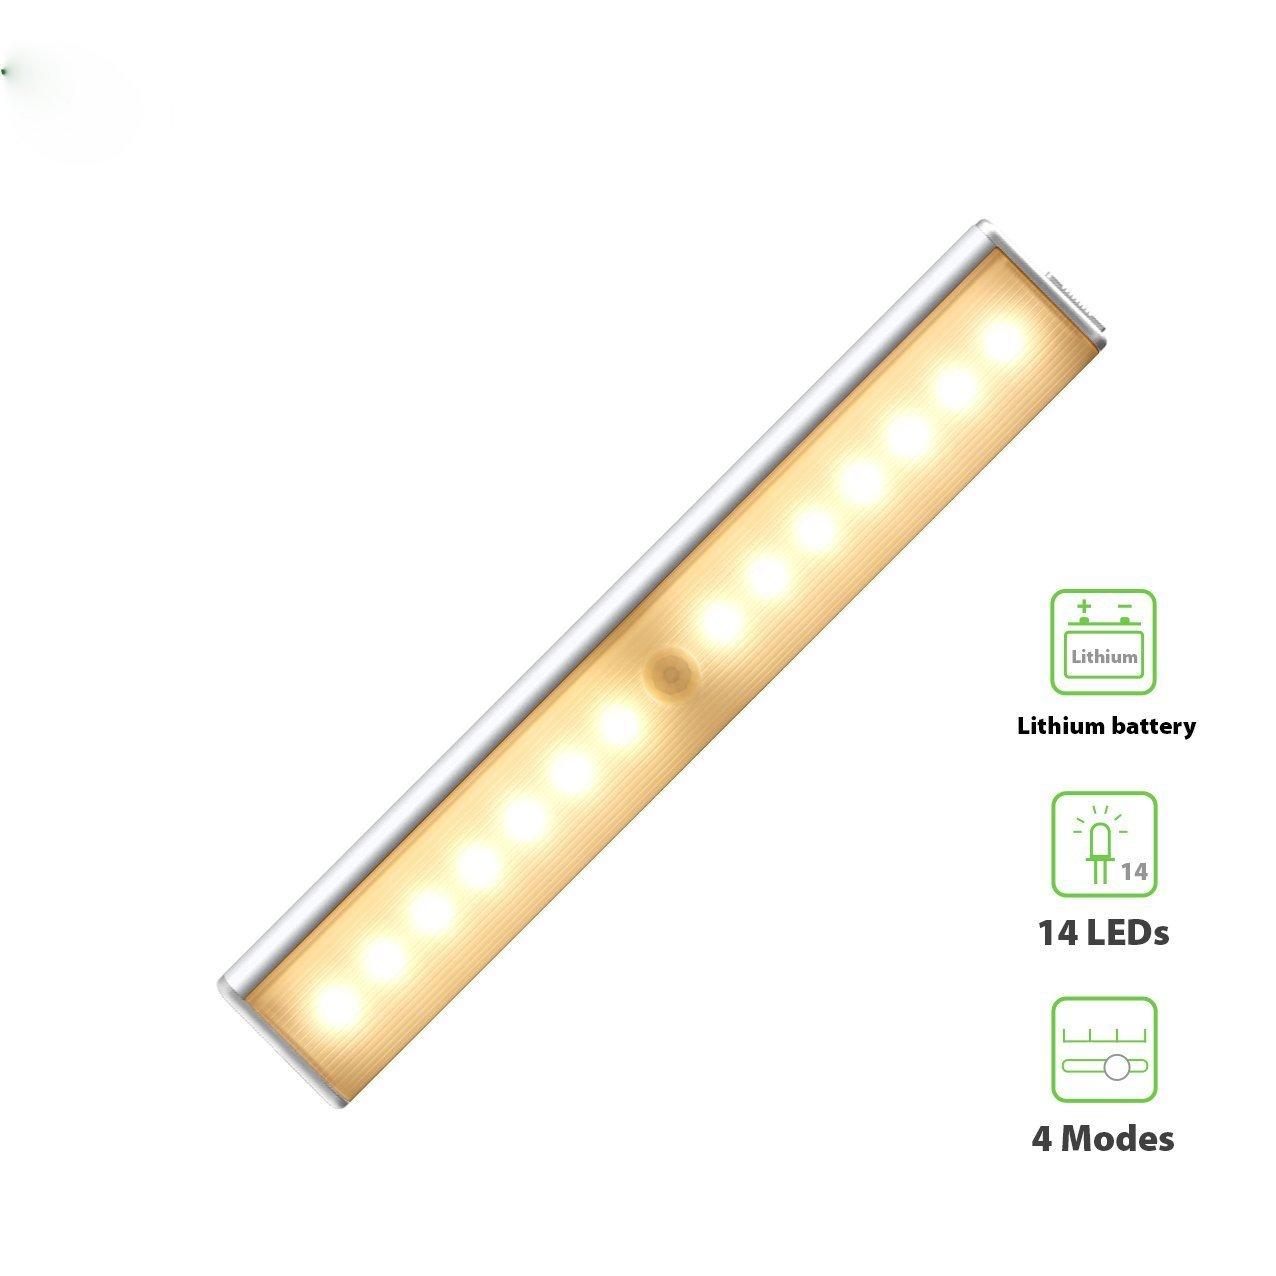 derlsonワイヤレスLEDモーションセンサーunder-cabinetライト、充電式モーション検知ライトforワードローブ、クローゼット、引き出し、廊下、Attics ( 2 - Pack ) DS-WML105YP B01IEGOQRO 13791 Rechargeable 14LED (Warm light /3000K) Rechargeable 14LED (Warm light /3000K)